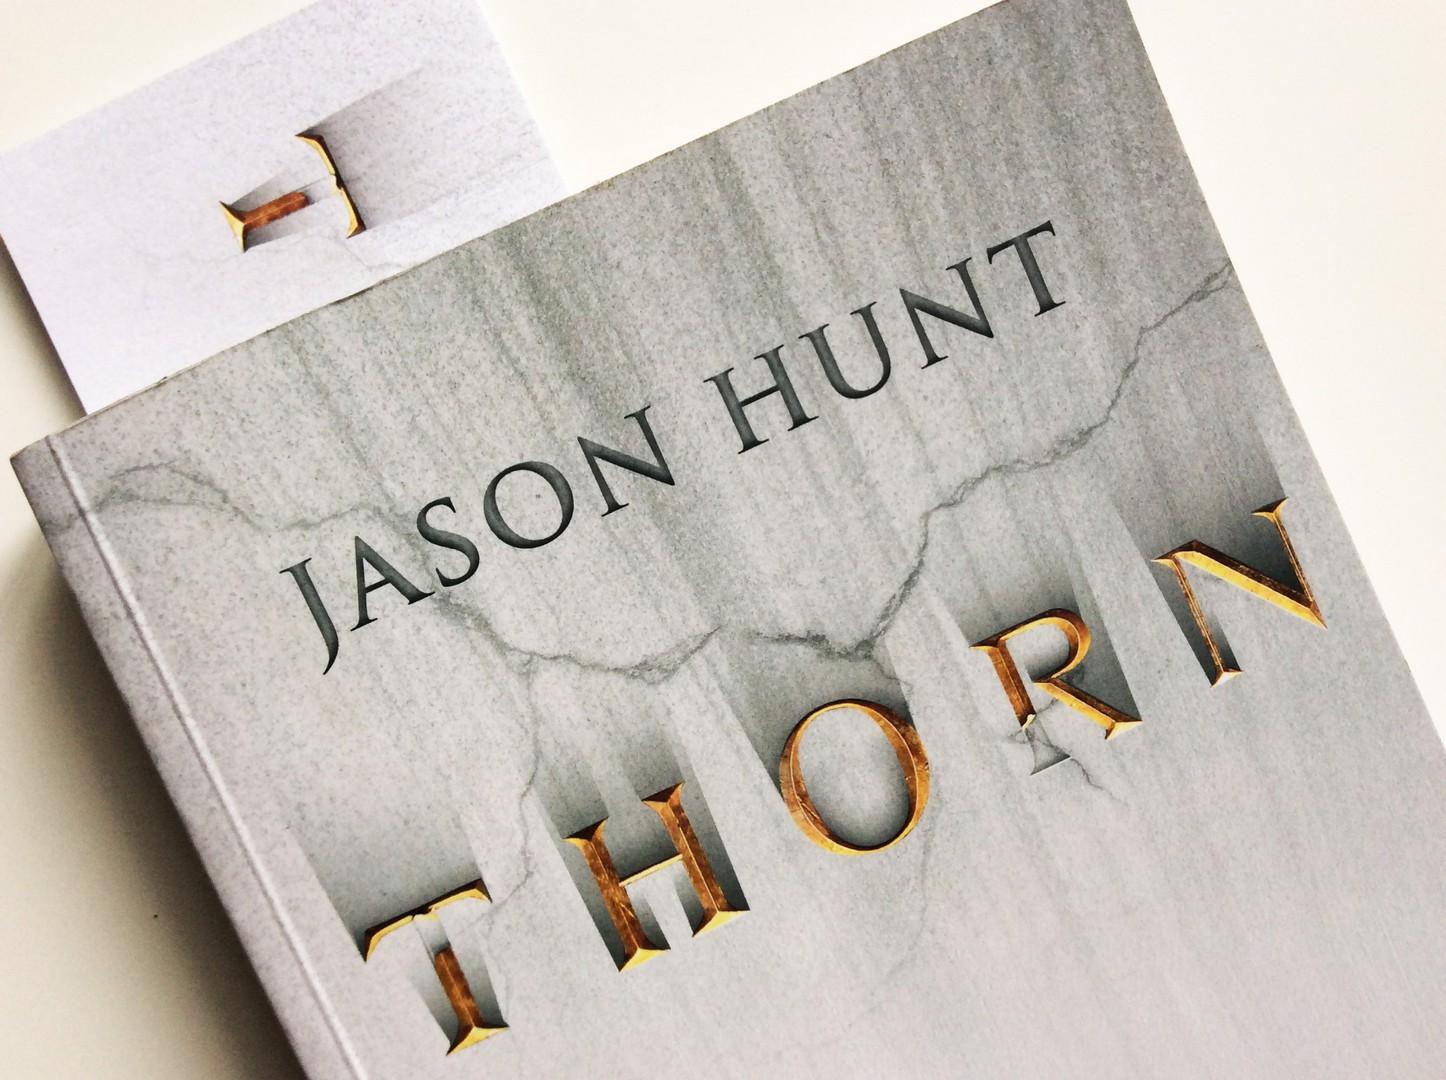 Thorn = pomyśl